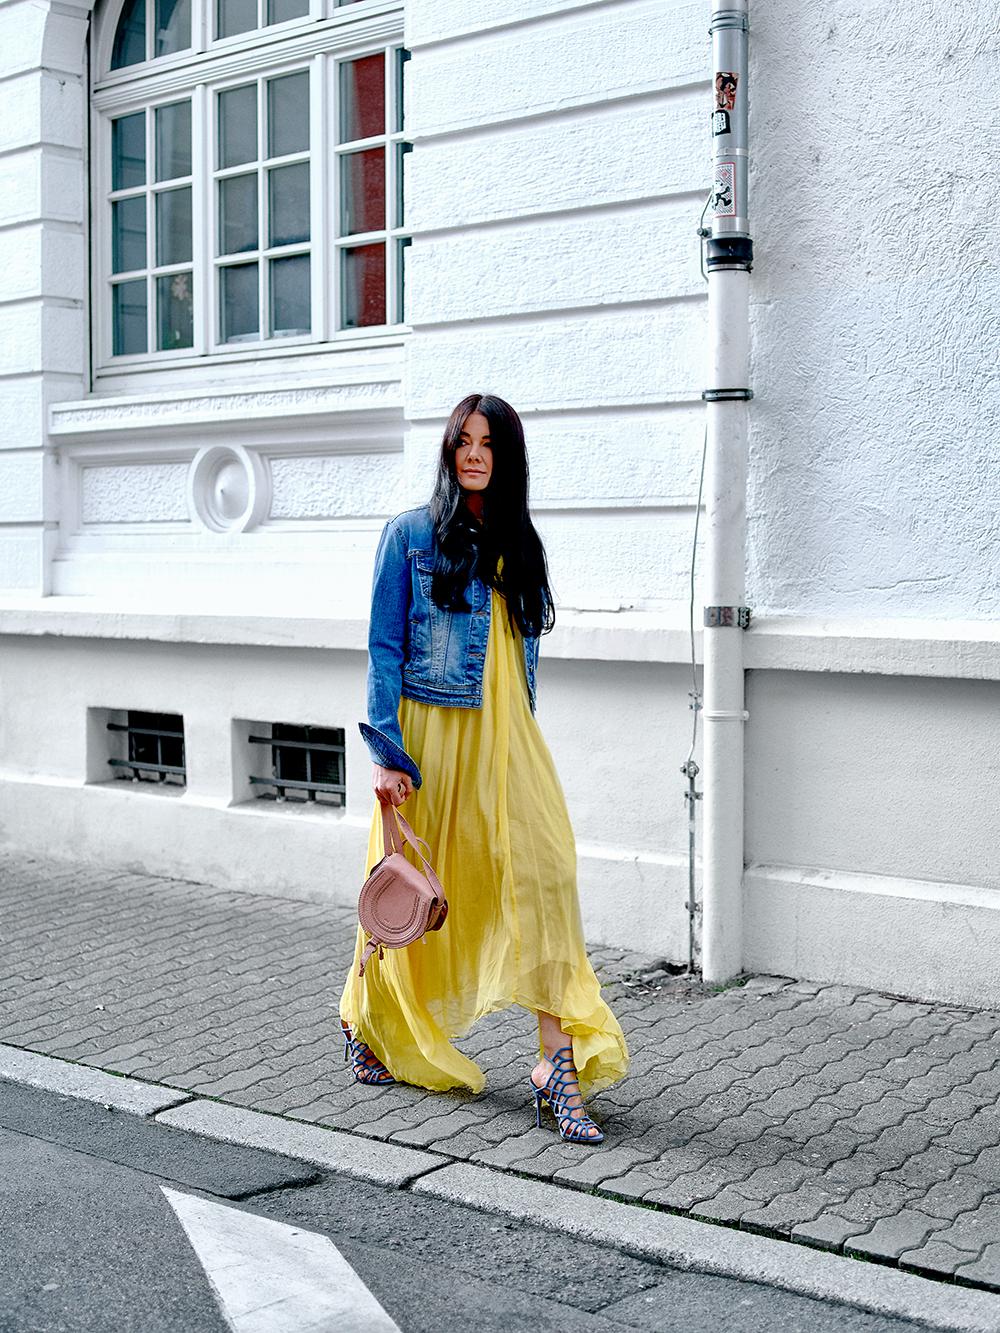 fashionambit-fashionblog-muenchen-modeblog-deutschland-blogger-modeblogger-fashionblogger-bloggerdeutschland-lifestyleblog-munich-style-blog-gelb